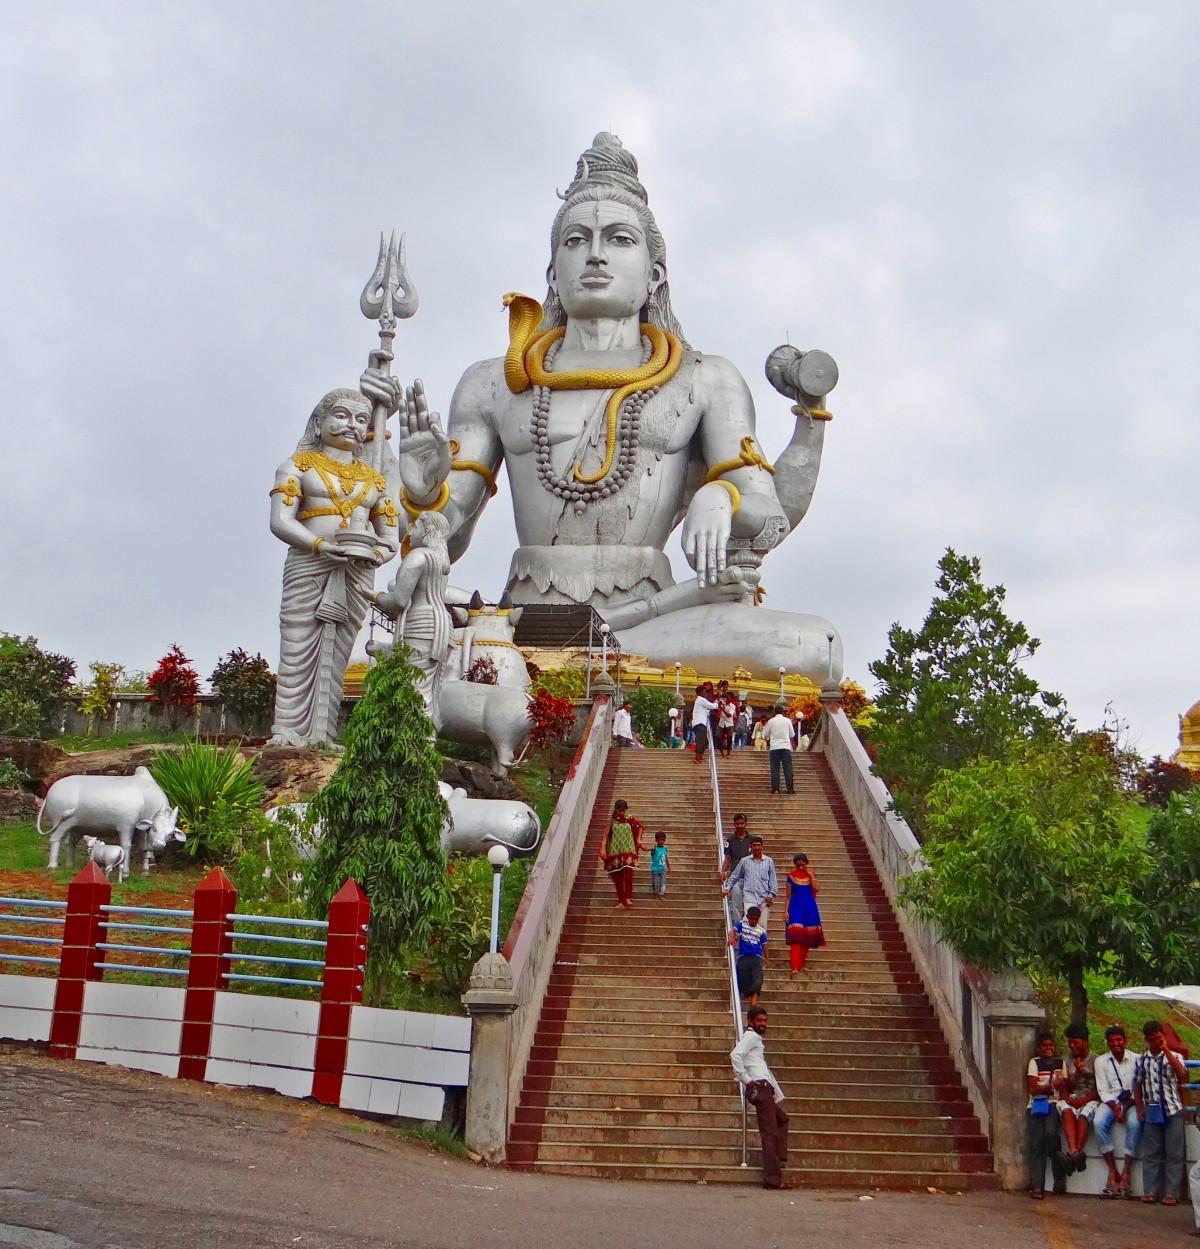 Skyscraper Wallpaper Hd Free Images Park Religion Temple India Hindu